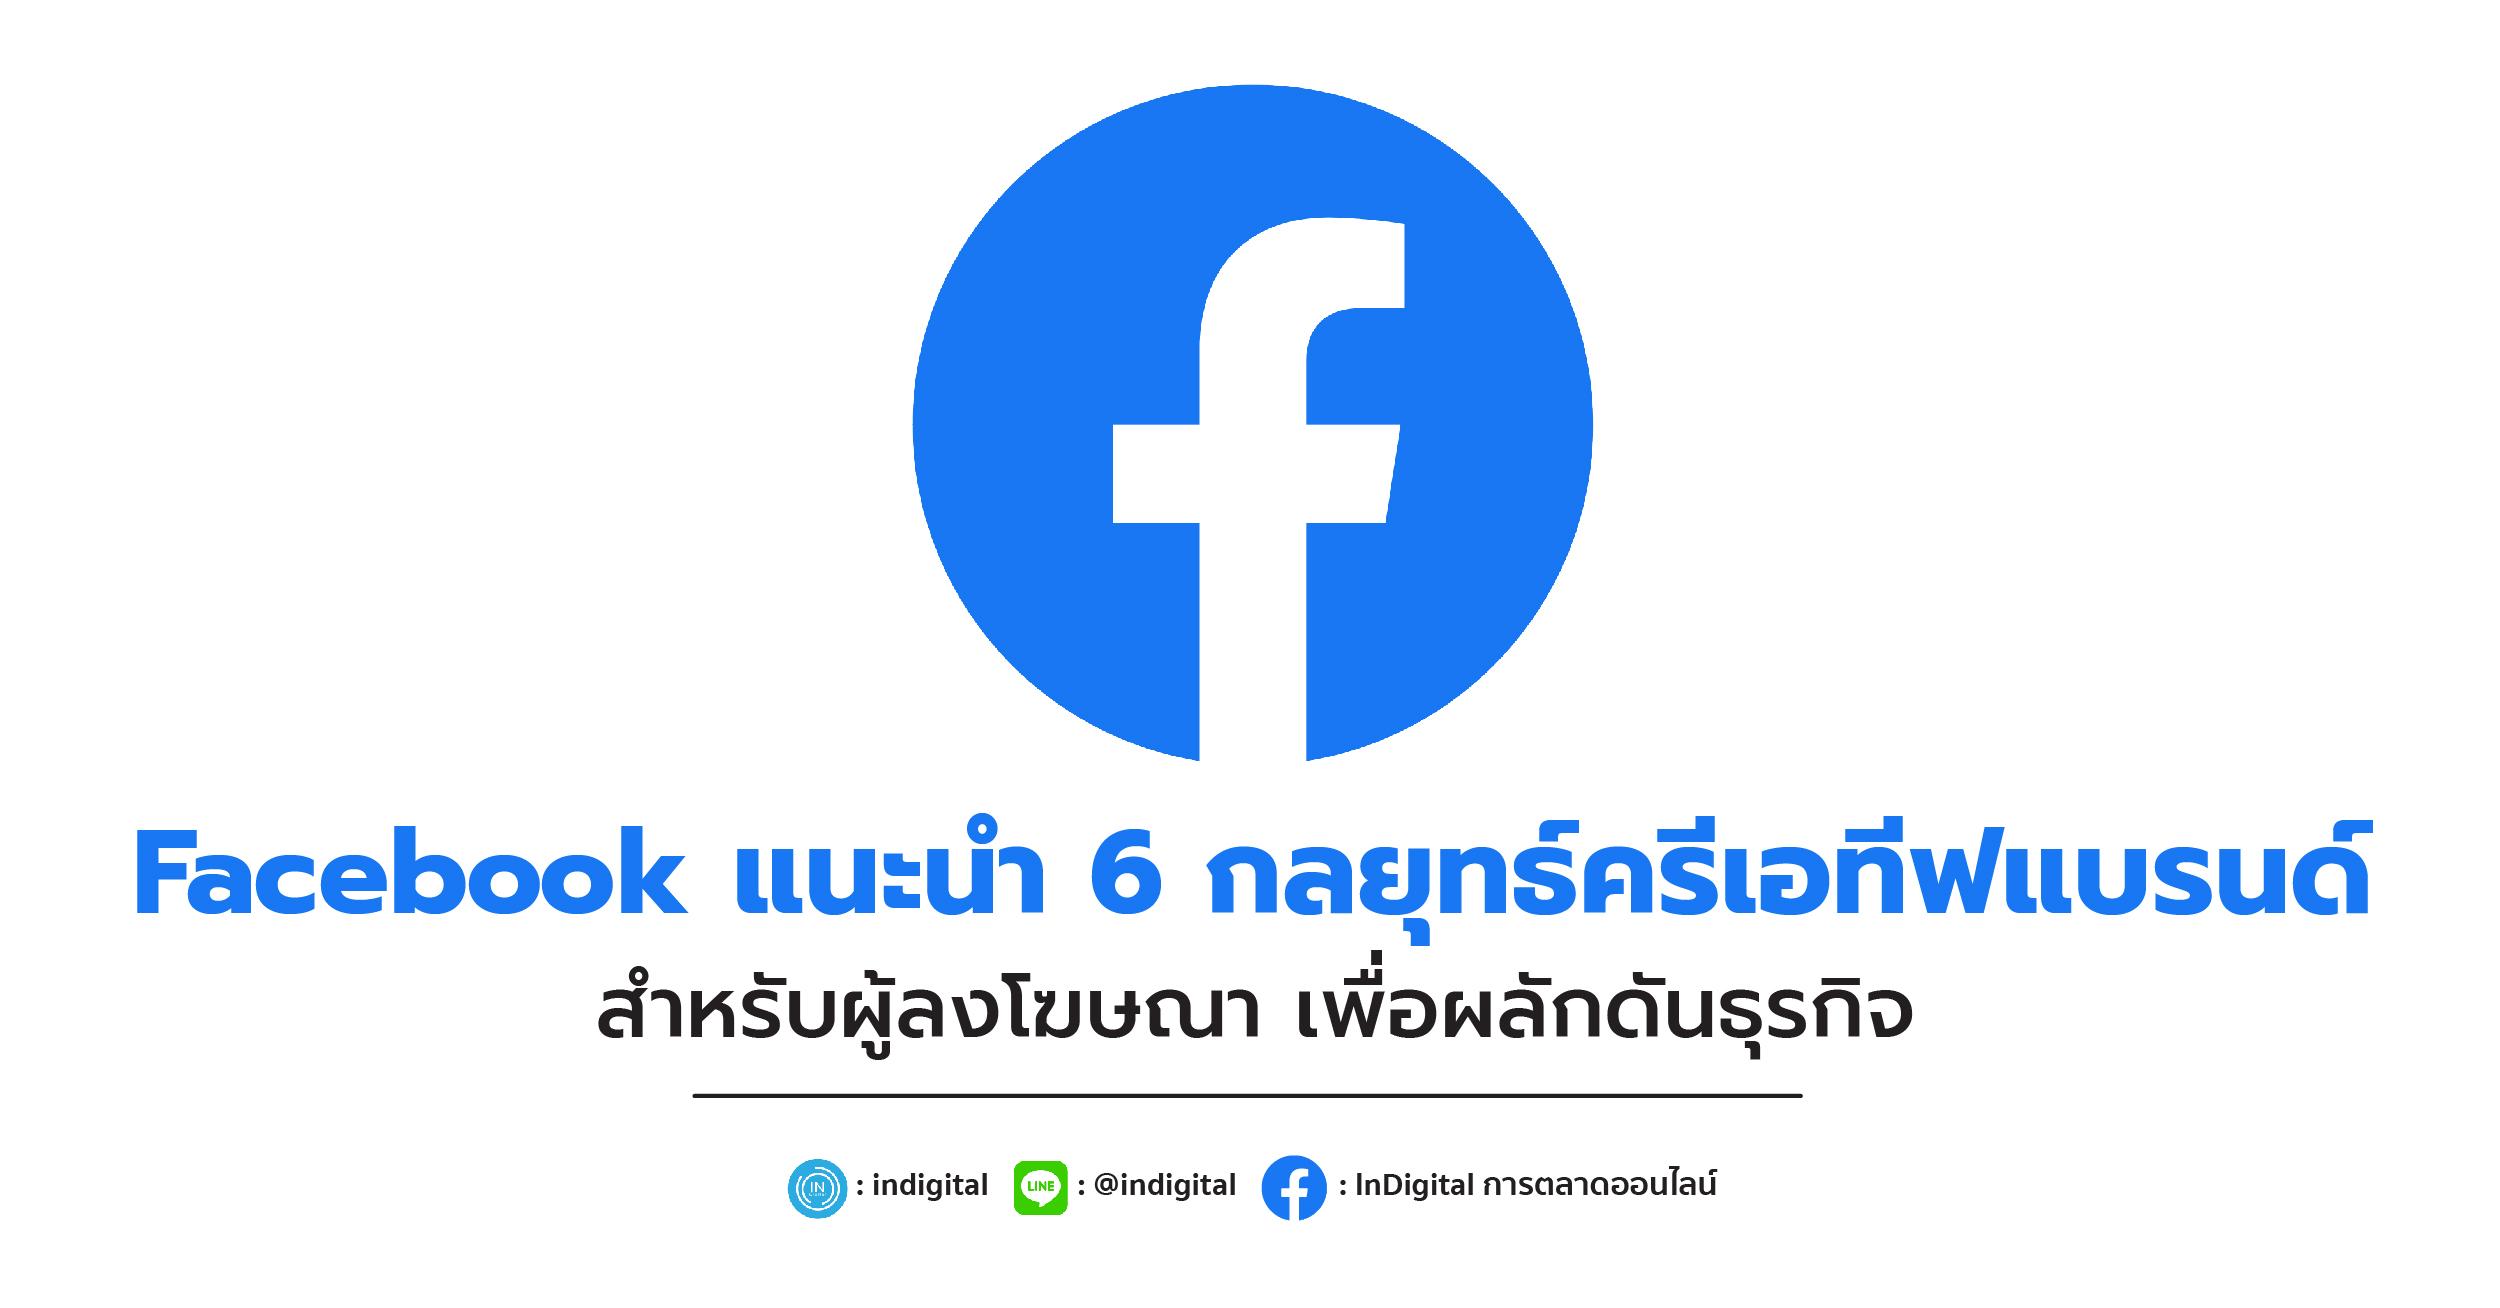 Facebook แนะนำ 6 กลยุทธ์ครีเอทีฟแบรนด์สำหรับผู้ลงโฆษณา เพื่อผลักดันธุรกิจ